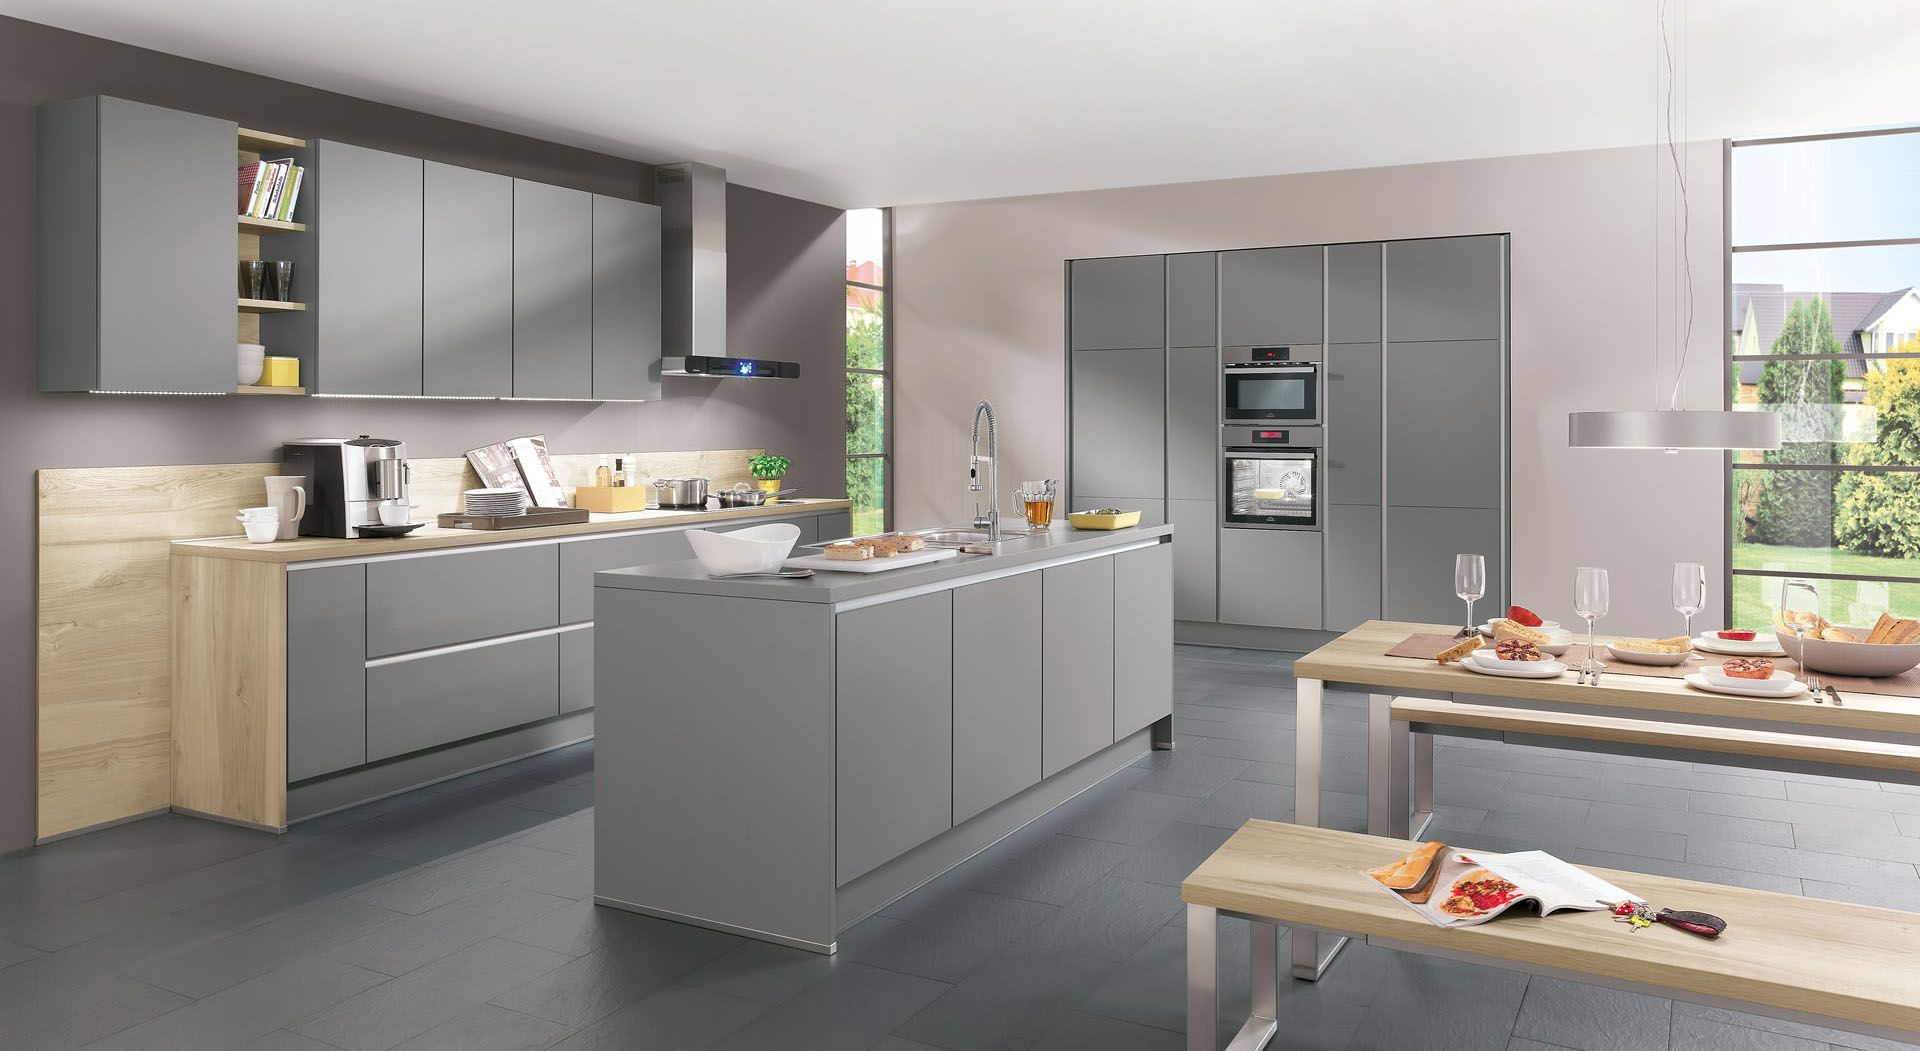 Cuisine Melun  Cuisine gris, Cuisines design, Intérieur moderne